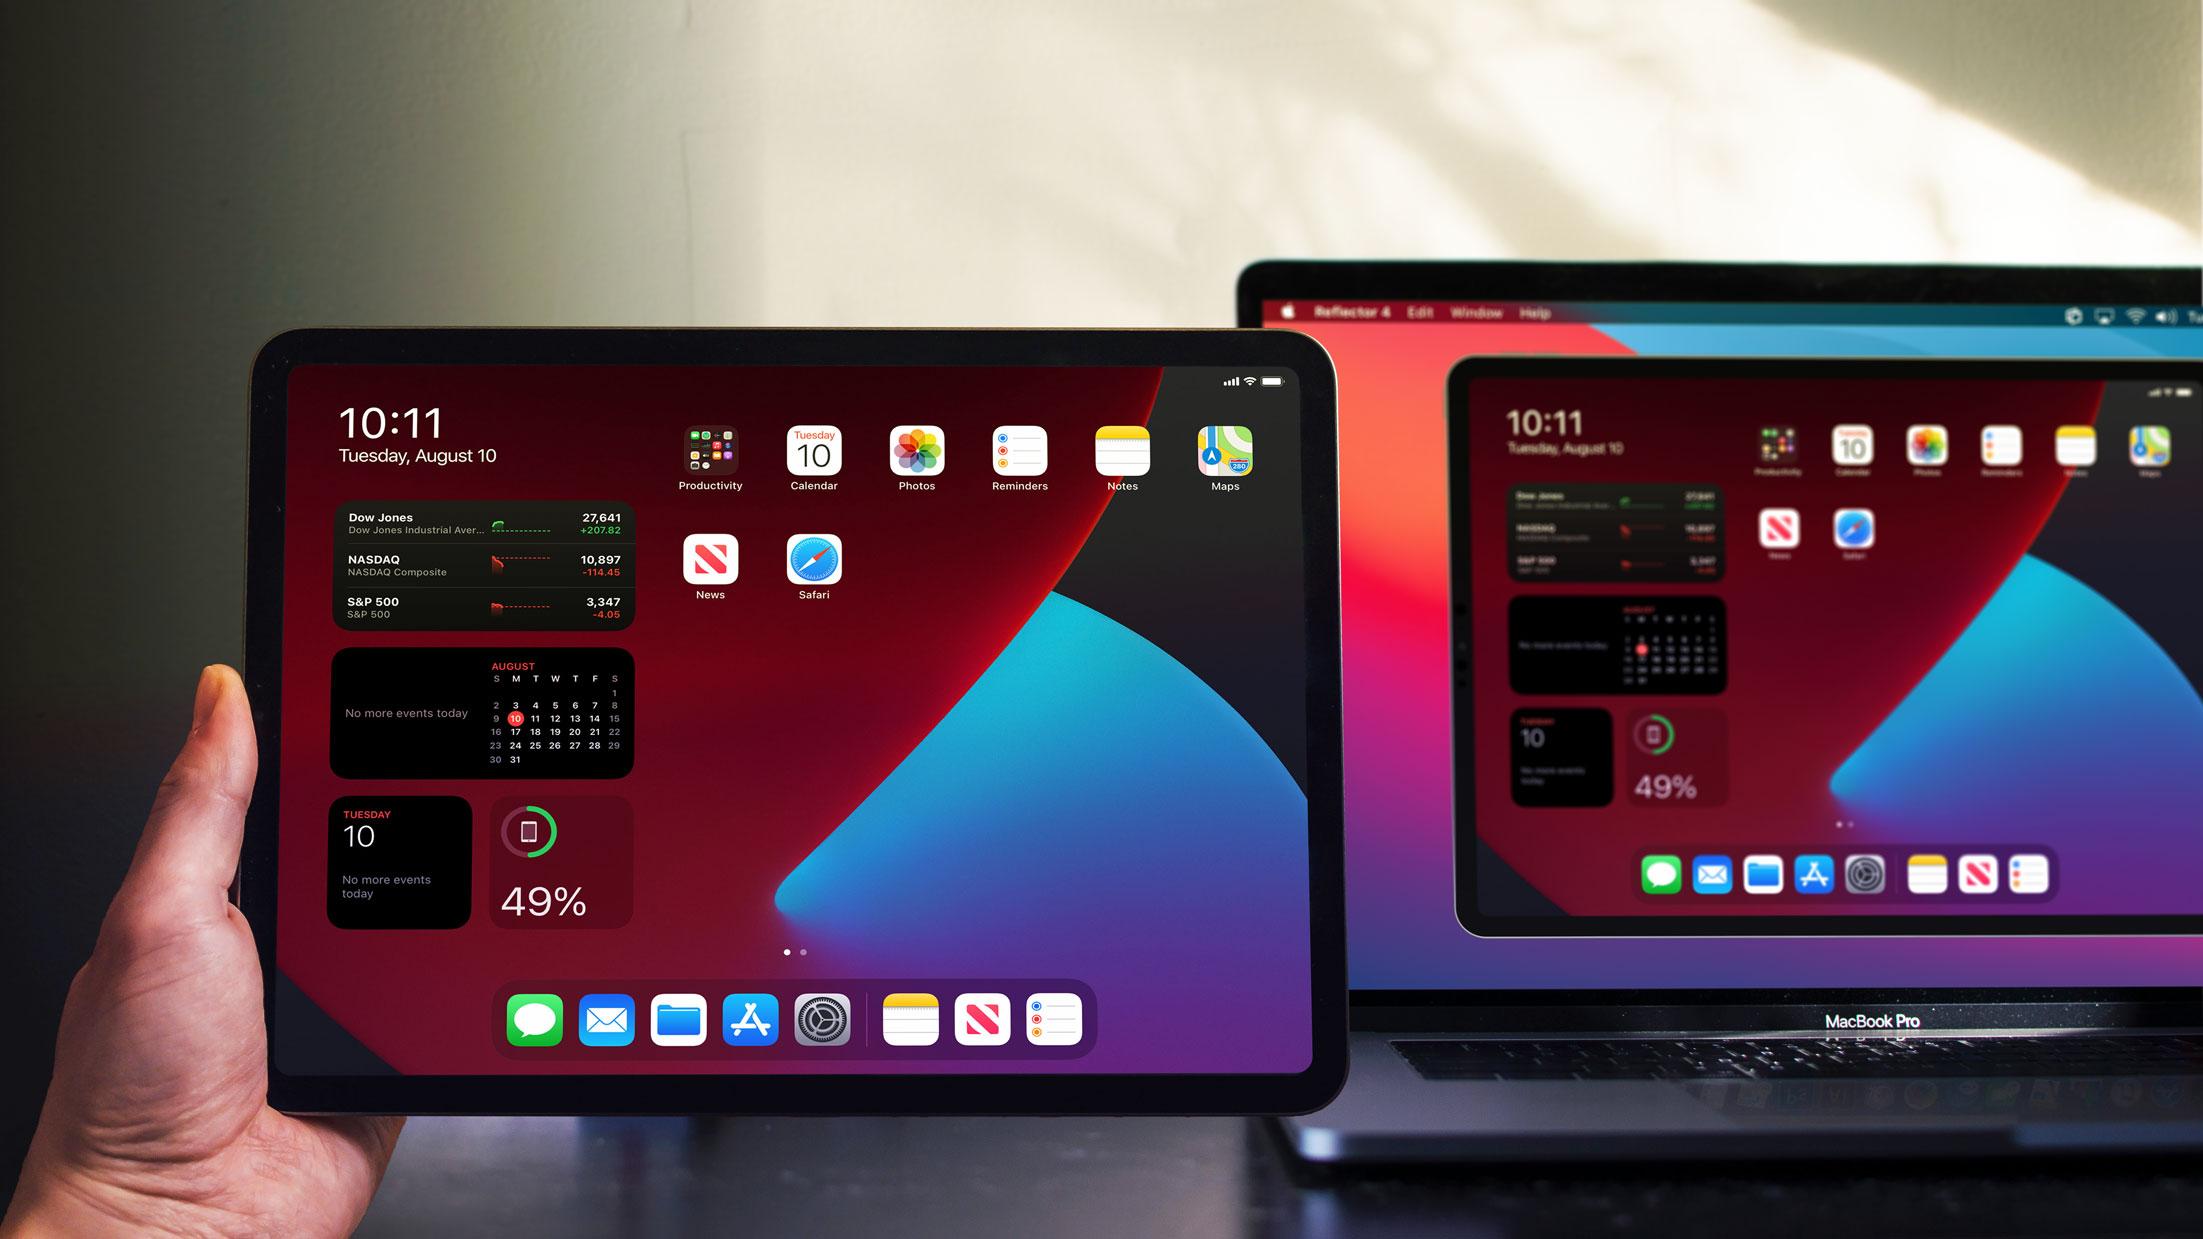 iPad screen mirroring to computer